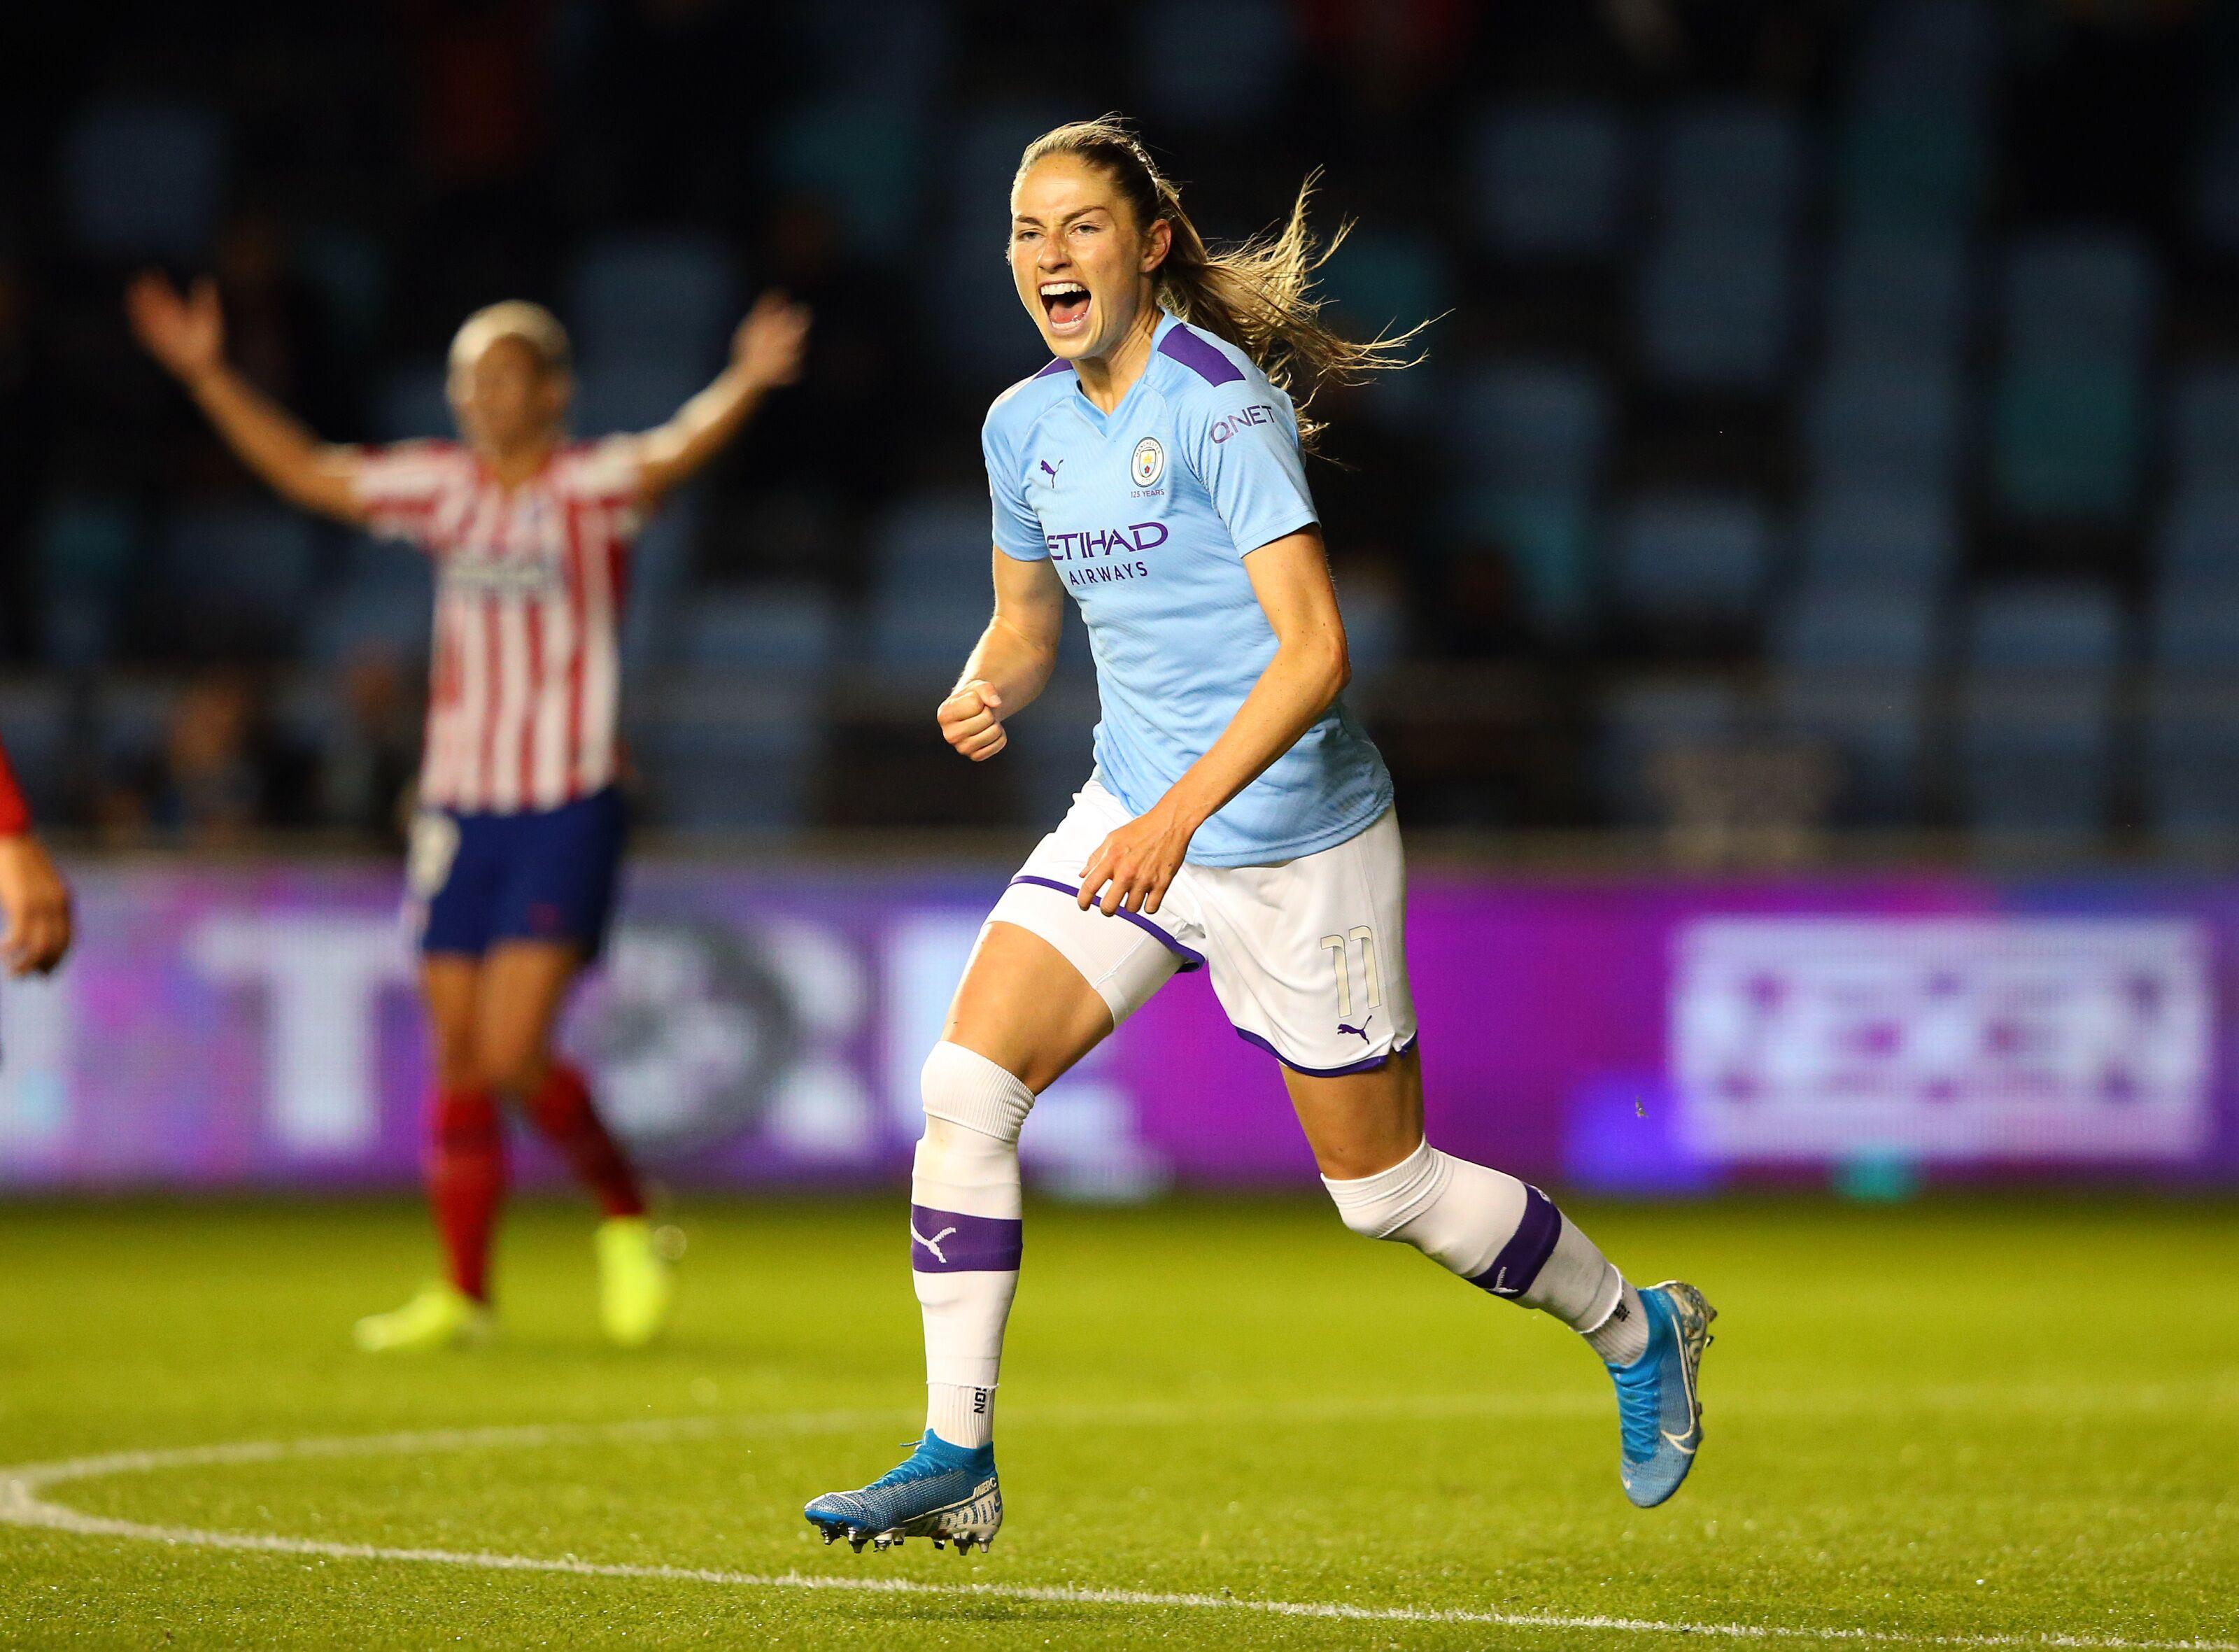 Manchester City Women 1 Athletico Madrid 1